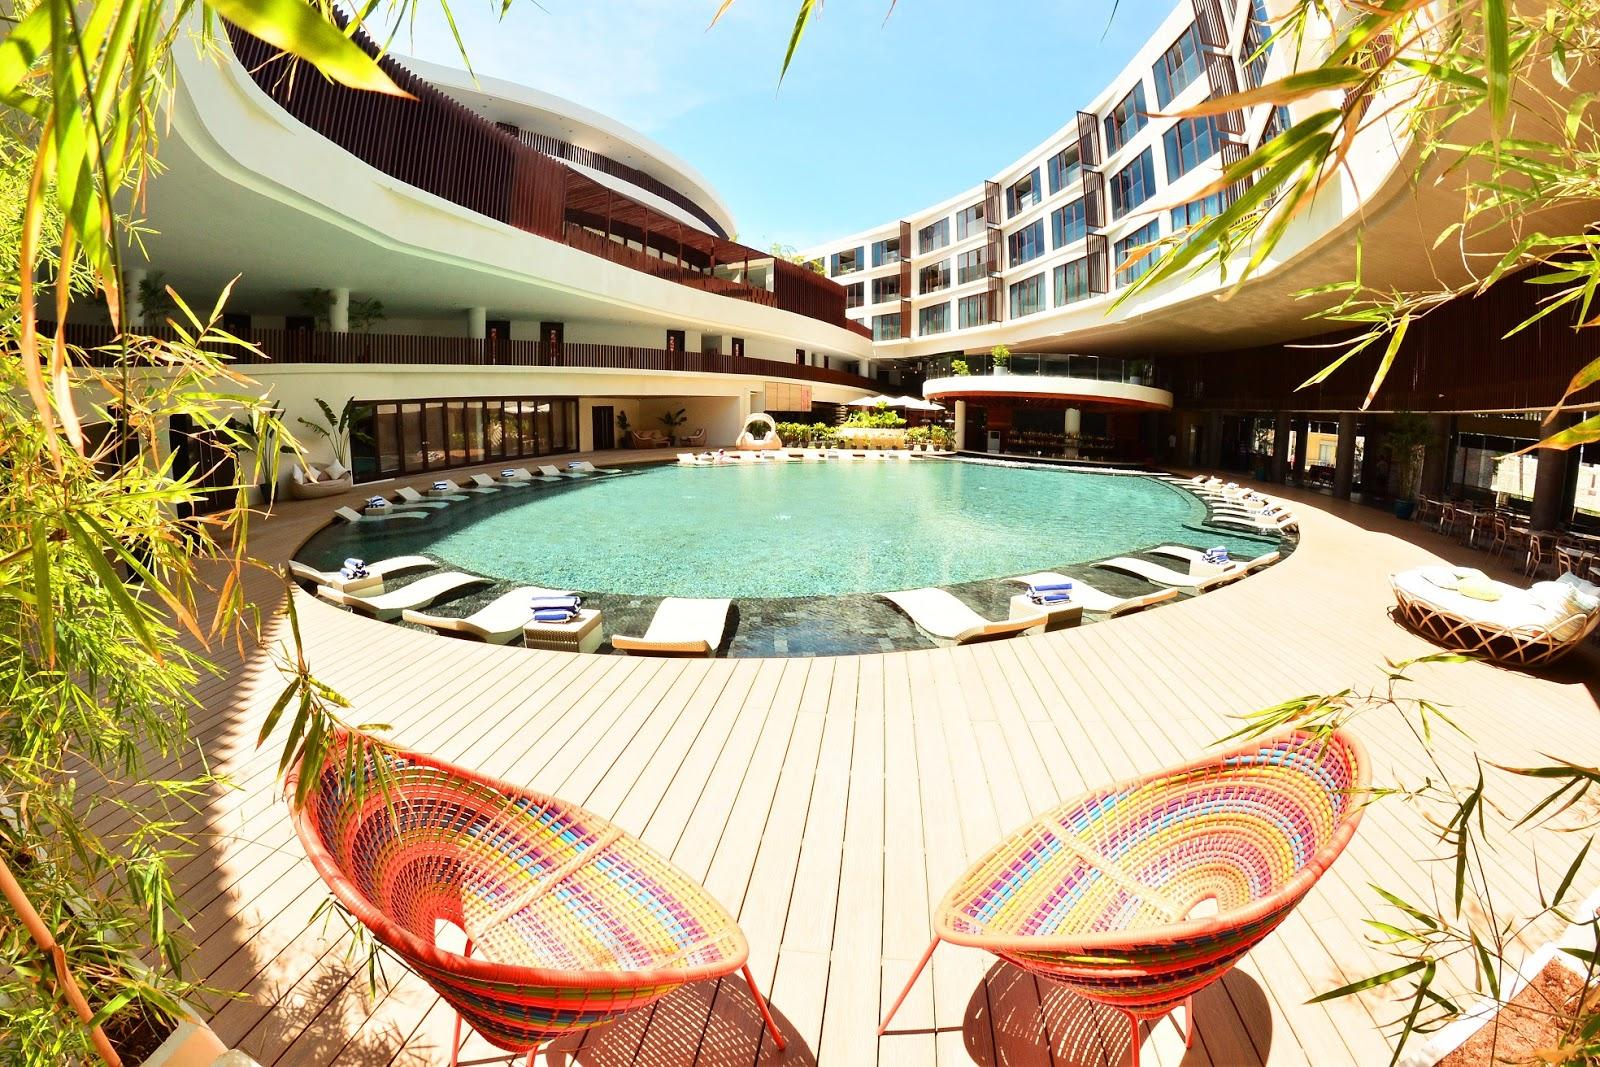 newly discover resort Khao lak emerald beach resort & spa is a newly opened beach resort discover khao lak khaolak emerald beach resort & spa is the ideal retreat to enjoy peace.